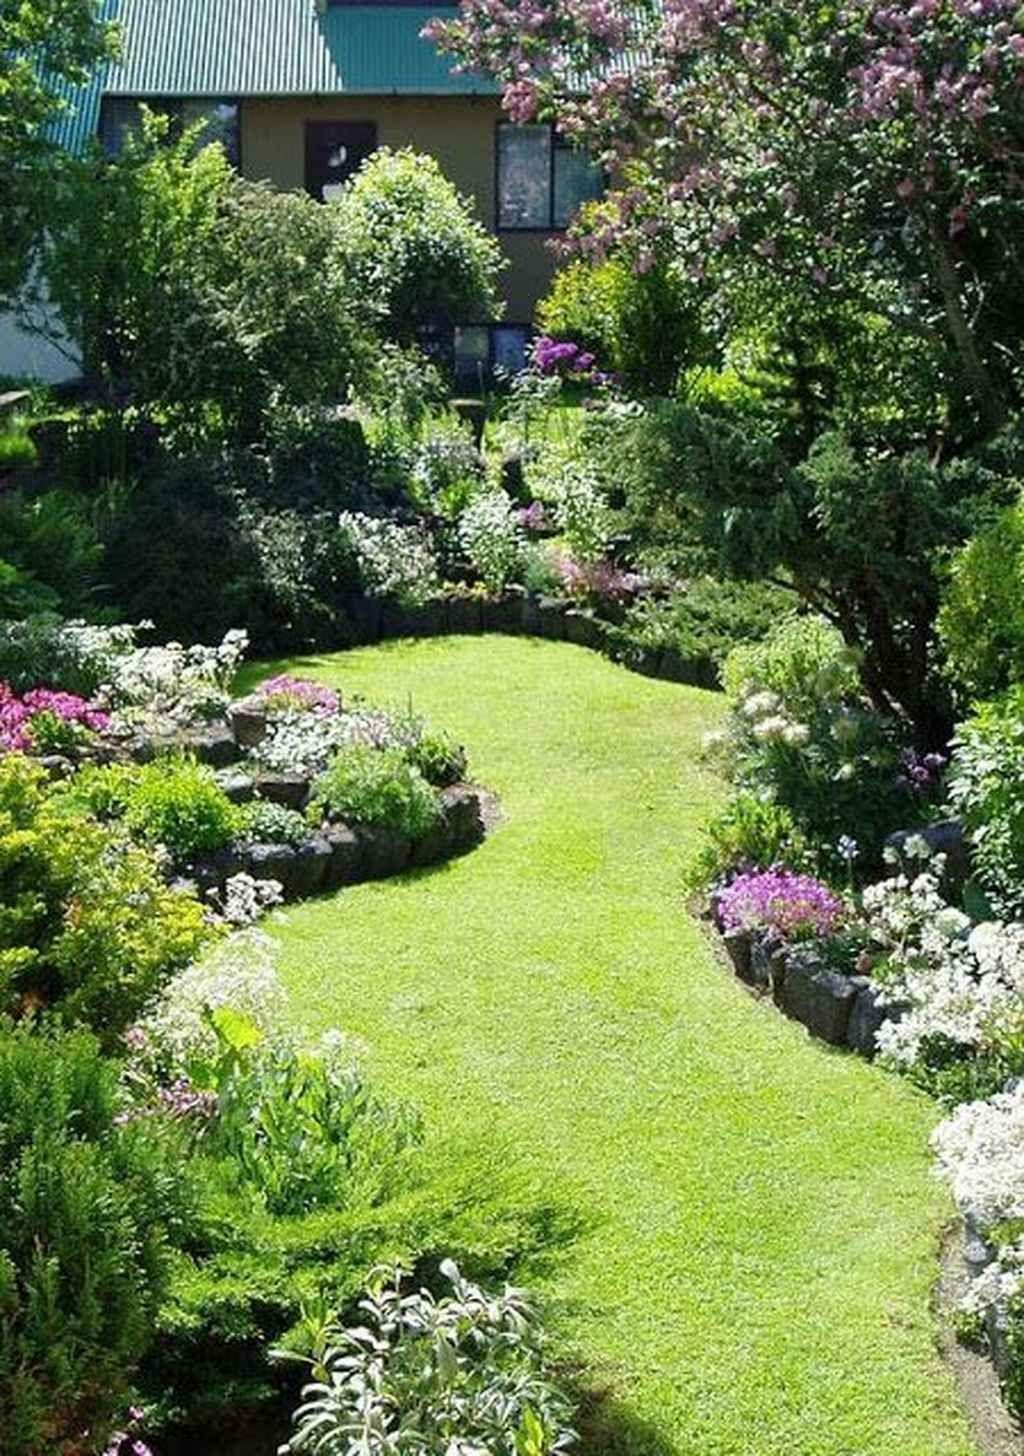 36 Amazing Cottage Garden Design Ideas - #amazing #cottage #cottagegardenide... - Elaine